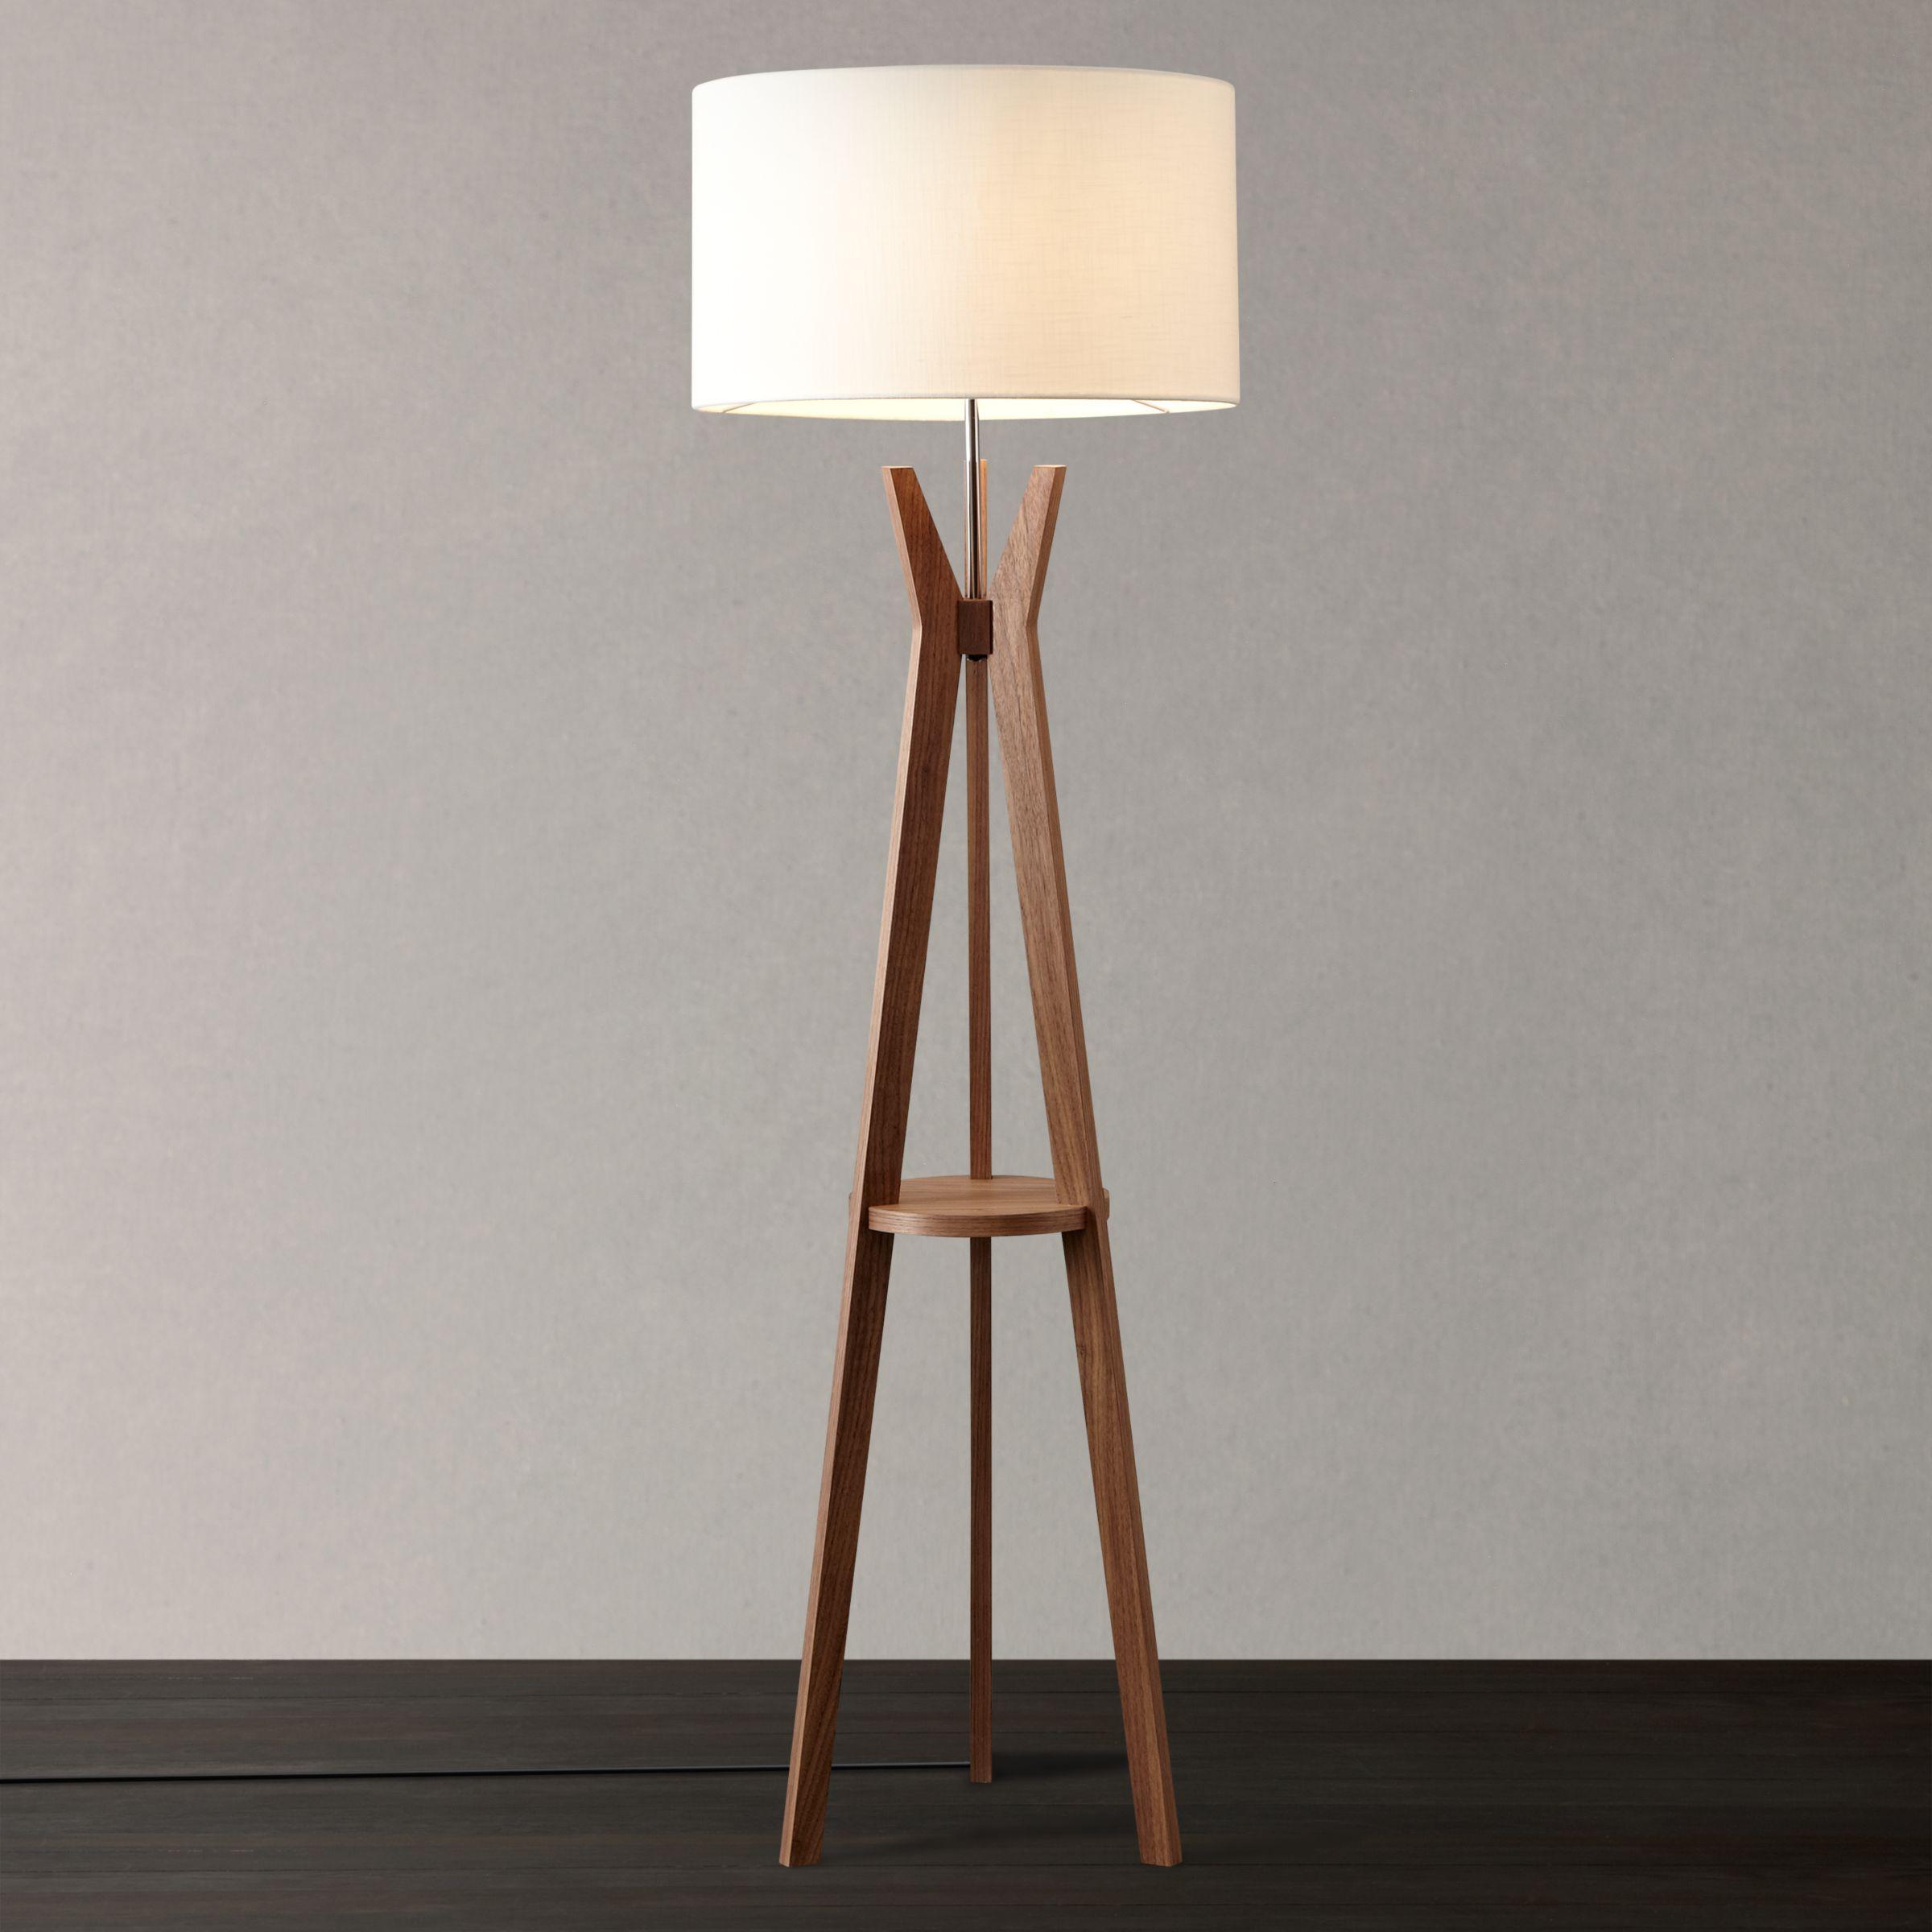 tripod floor lamp shop for cheap lighting and save online. Black Bedroom Furniture Sets. Home Design Ideas